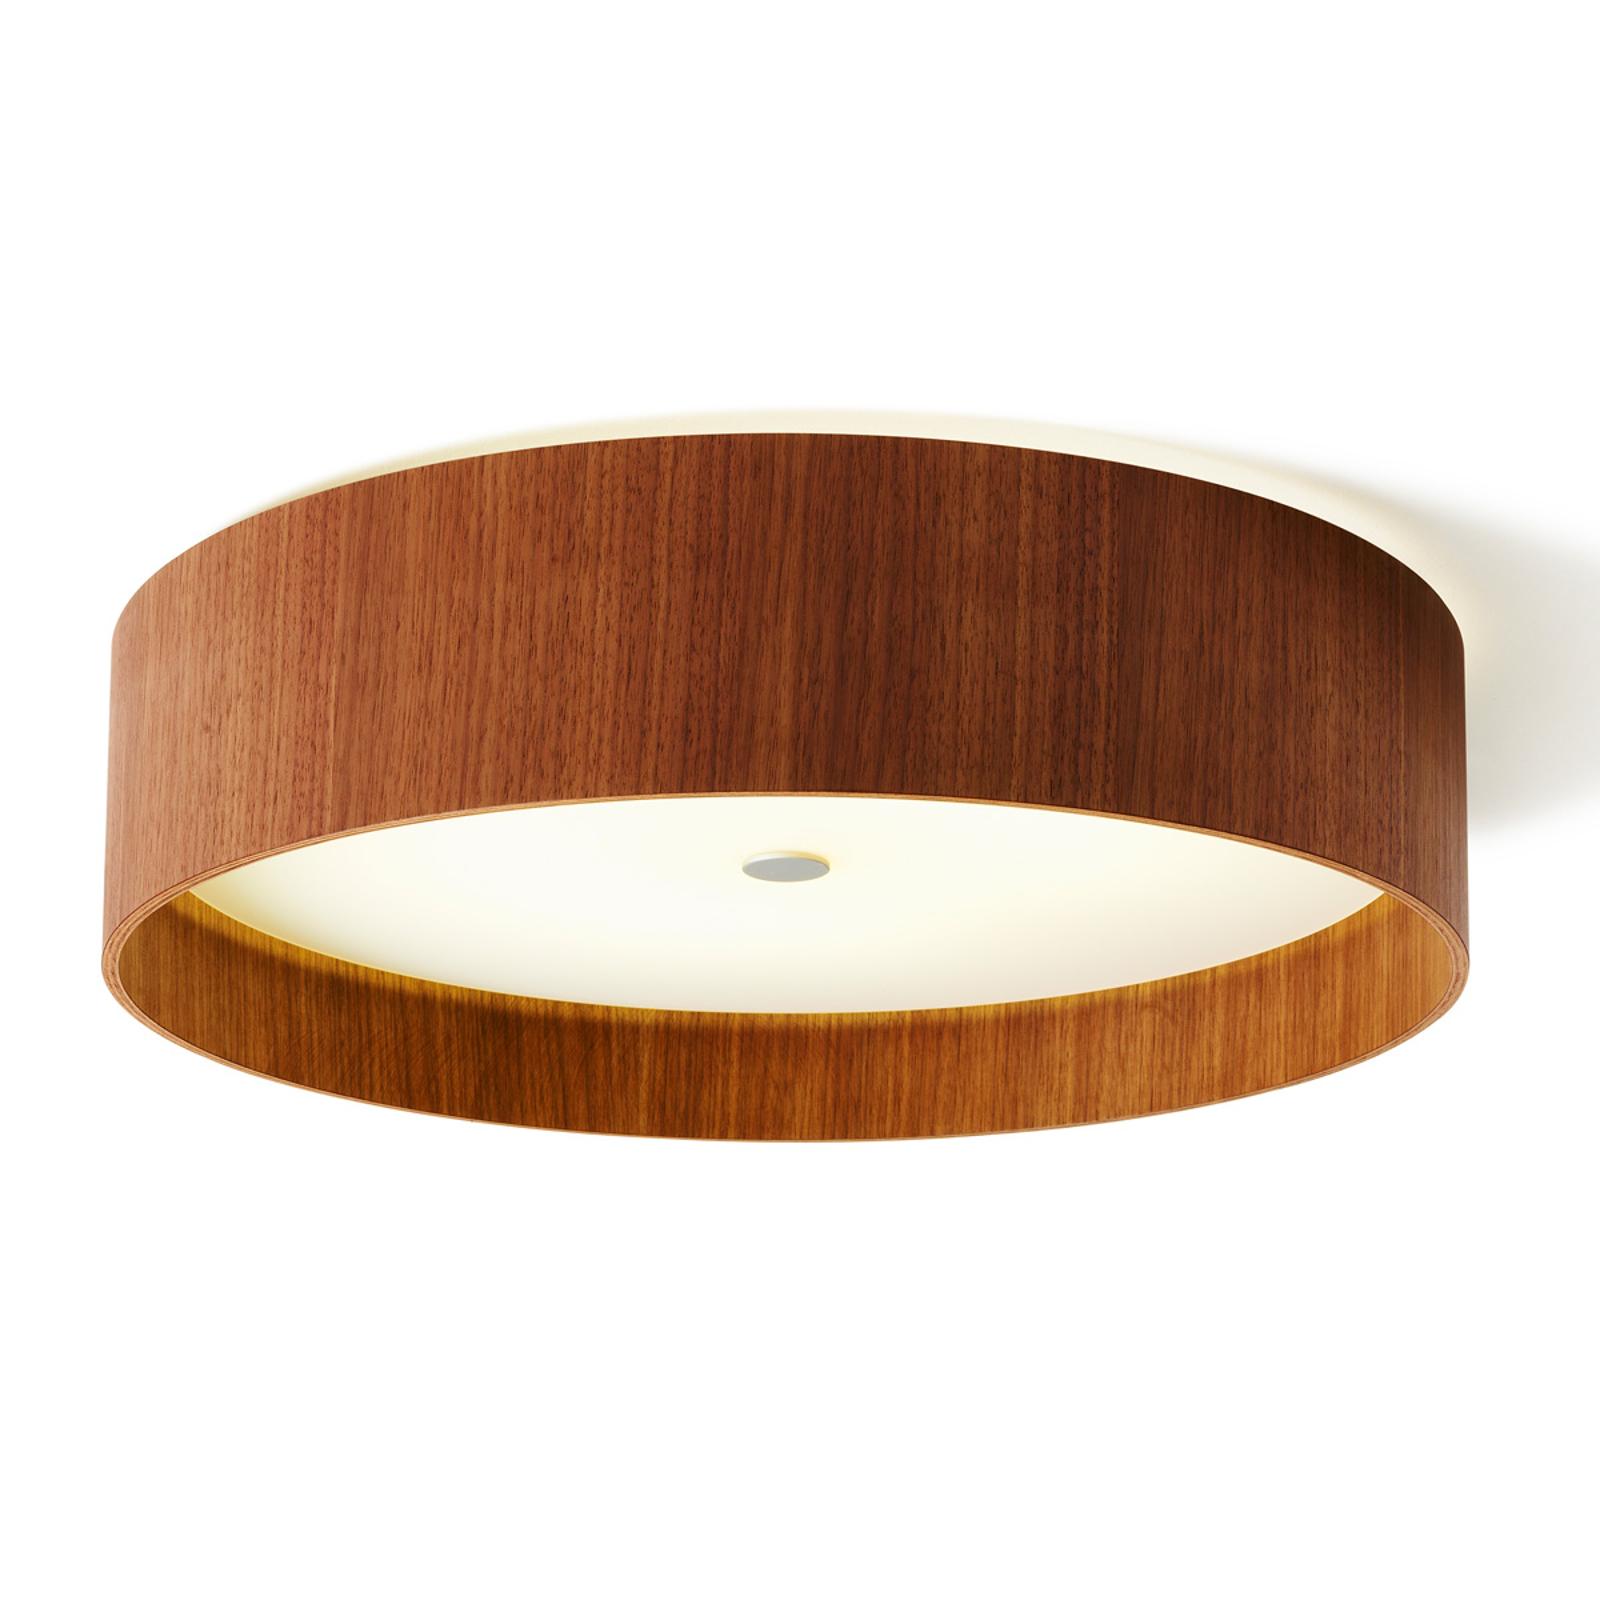 Plafonnier LED Lara wood en bois de noyer 55cm